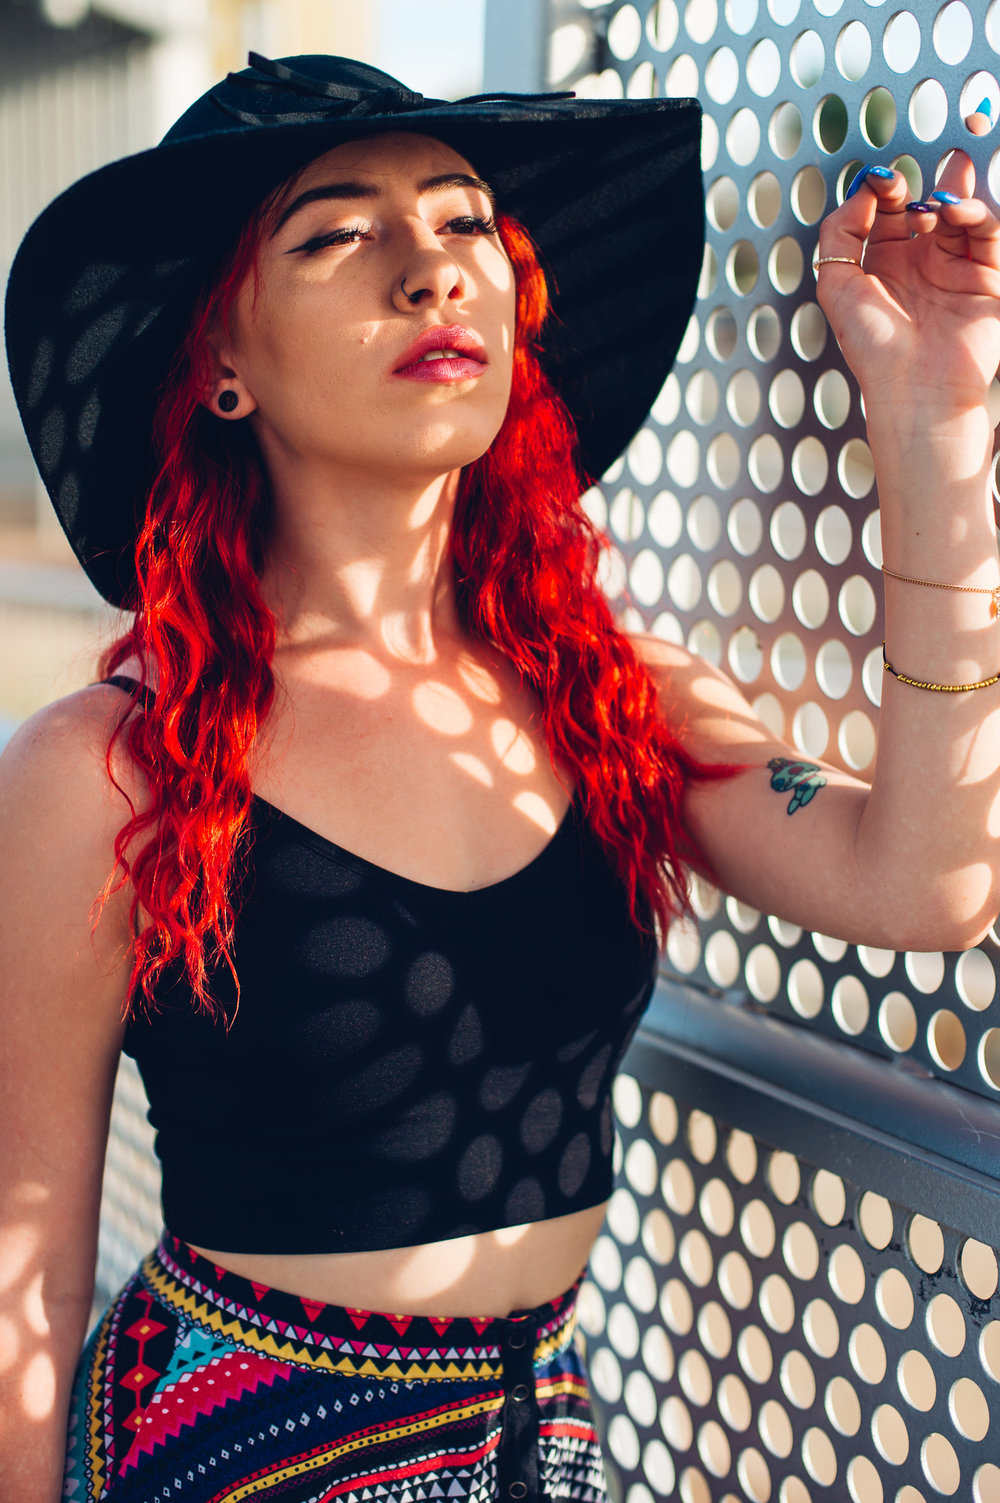 Courtney_AZFalls-12.jpg